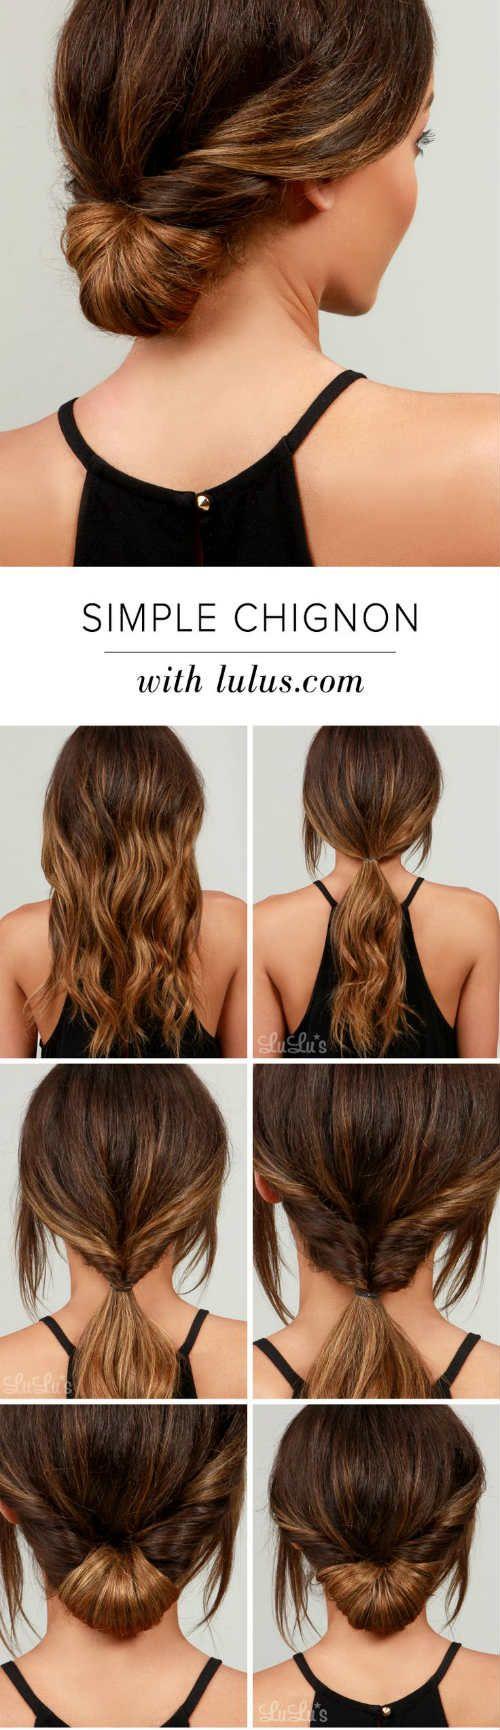 Peinados fáciles de cabello recogido [Fotos] | ActitudFEM✅